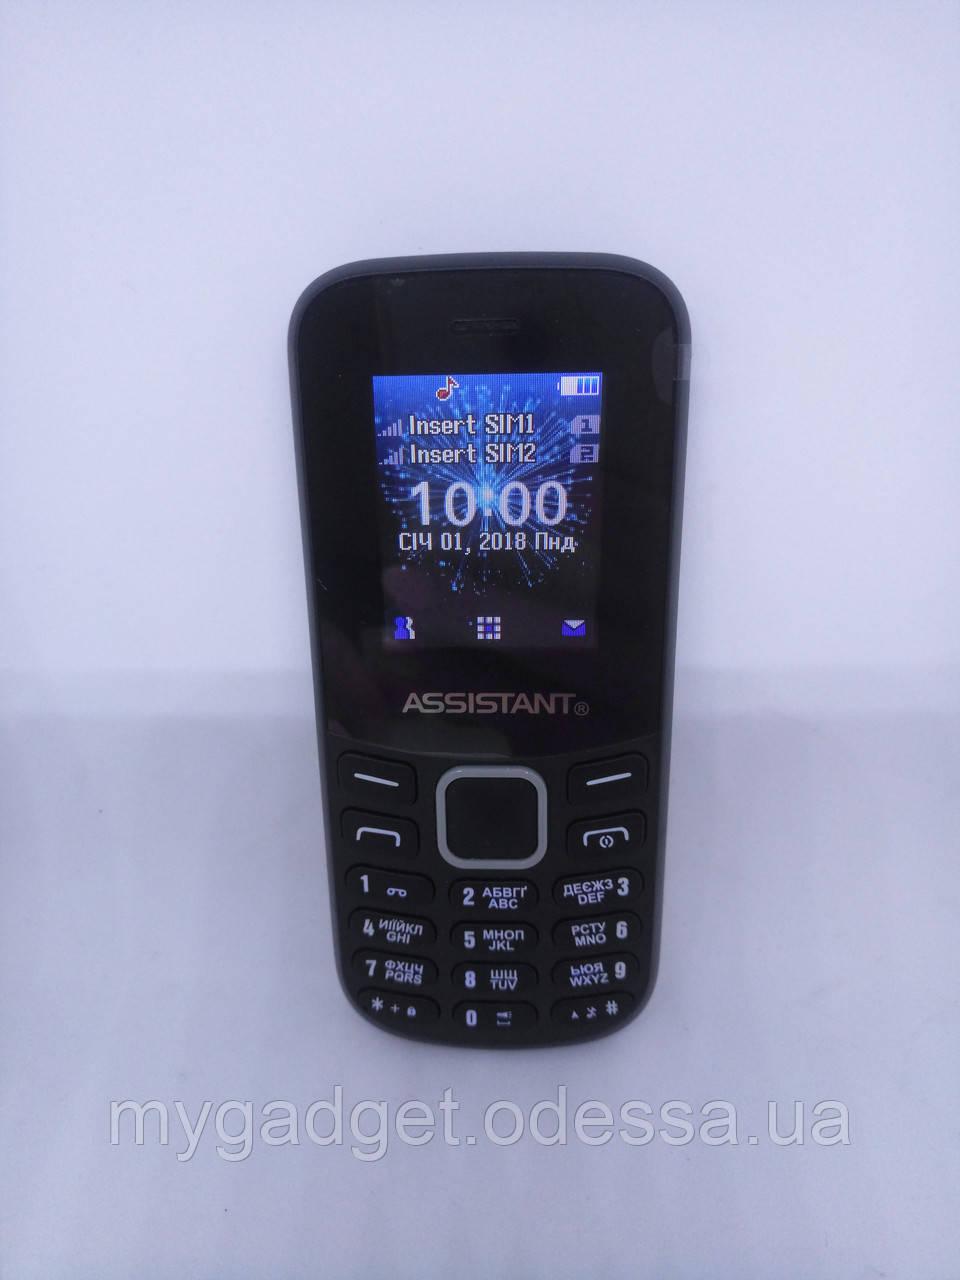 Кнопочный телефон Assistant AS-101 Black + Камера + Bluetooth + 900 мАч Гарантия!